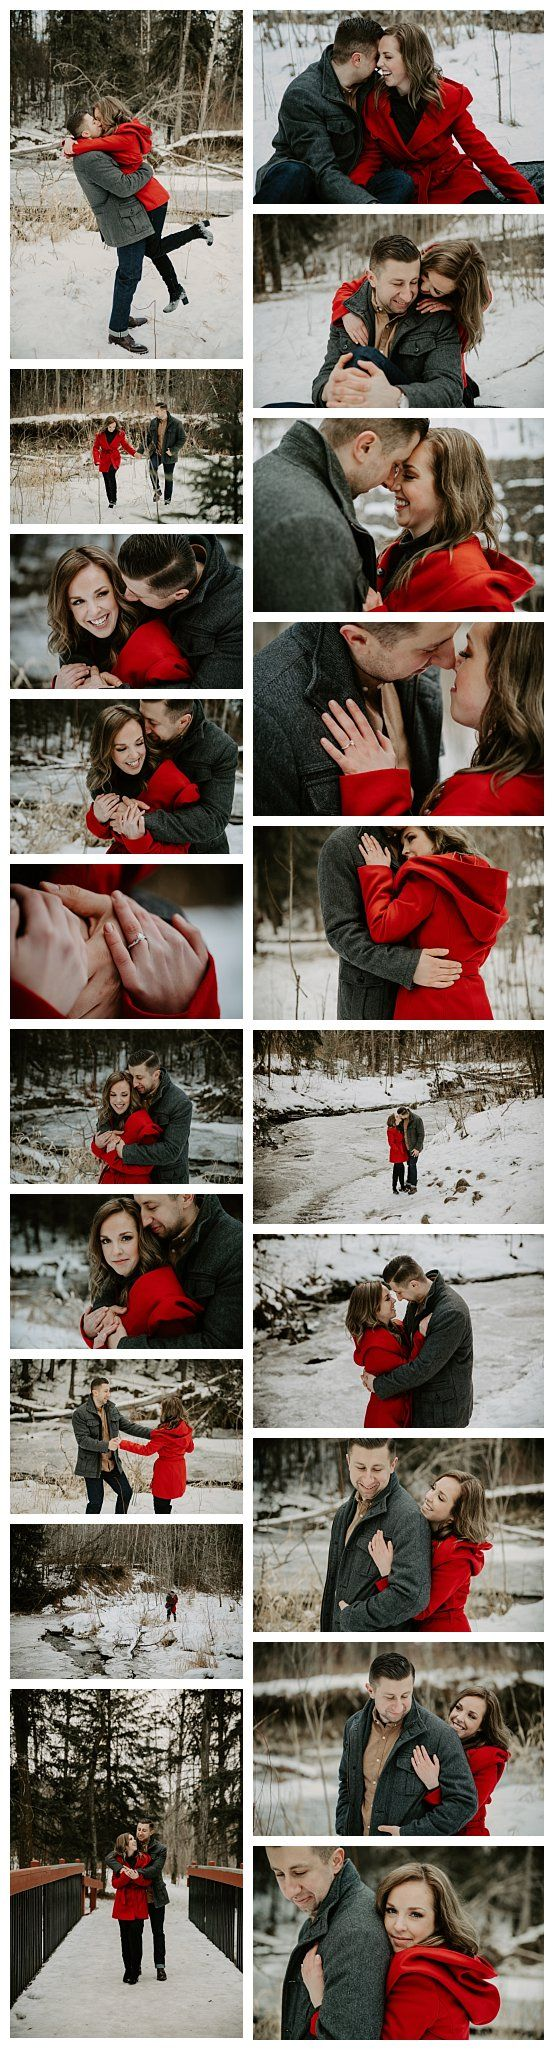 Winter engagement photos. Edmonton engagement photography. Mill creek ravine engagement photos.